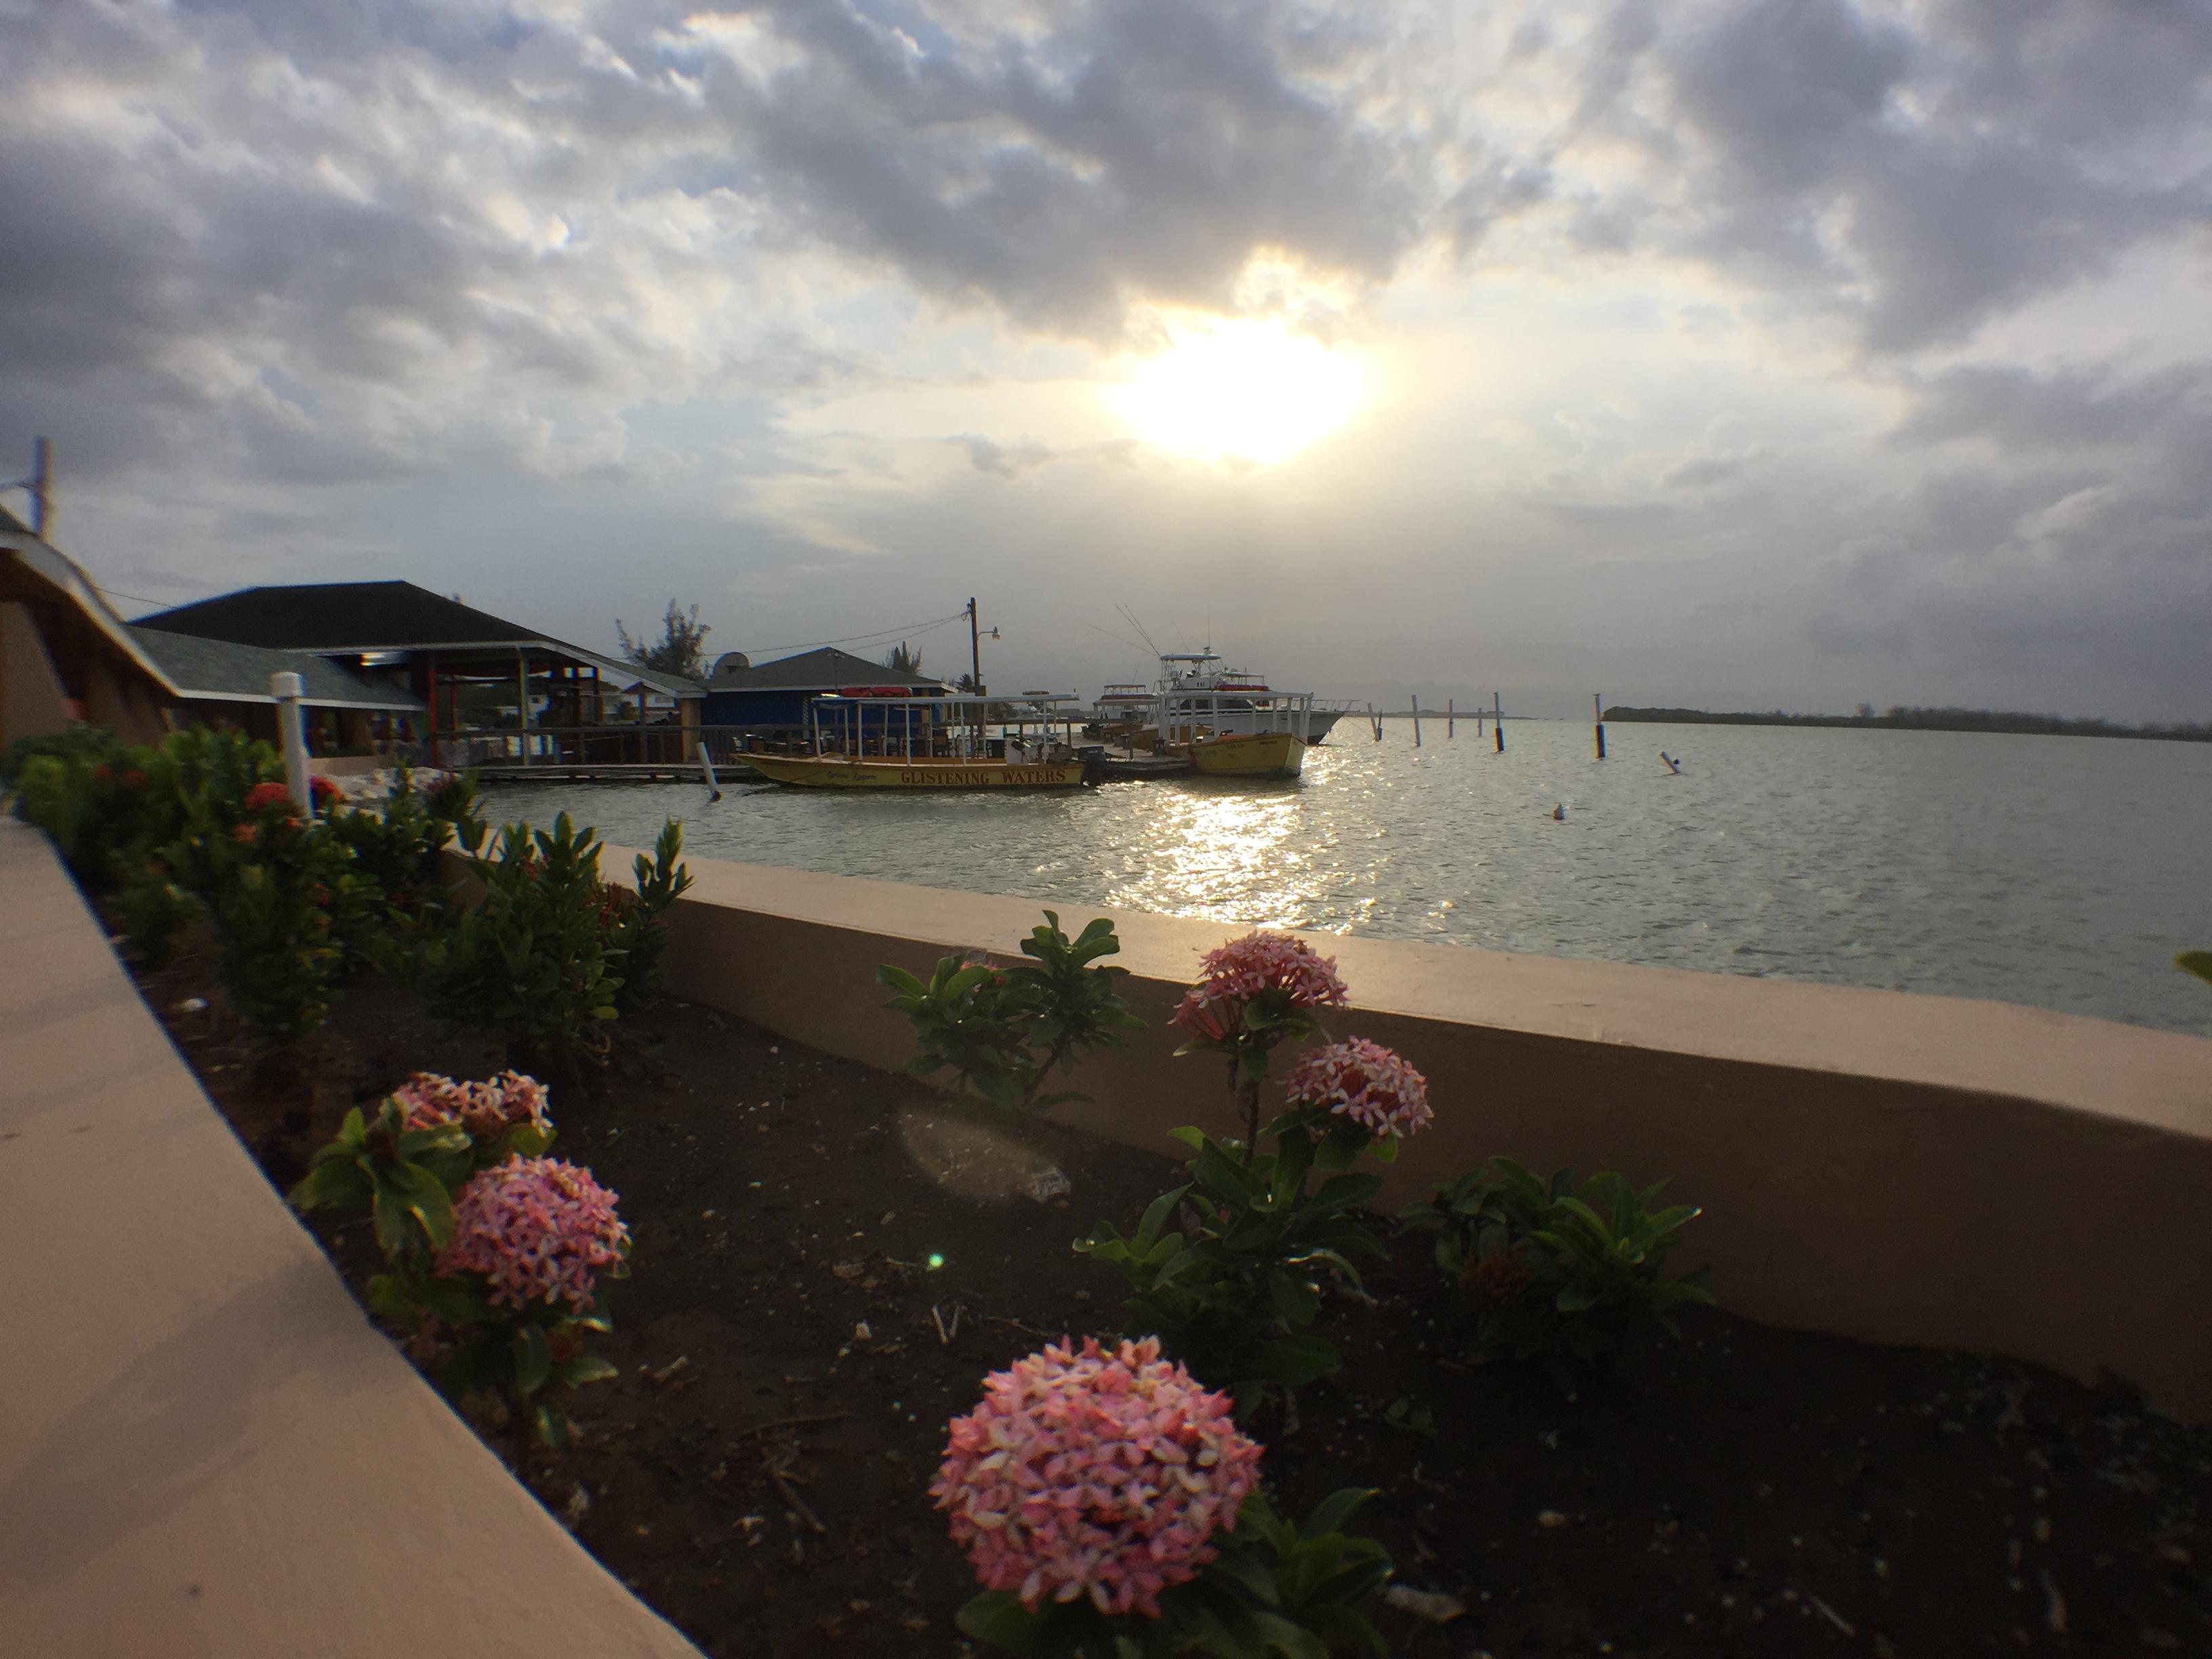 Landscaped Walkway & Marina